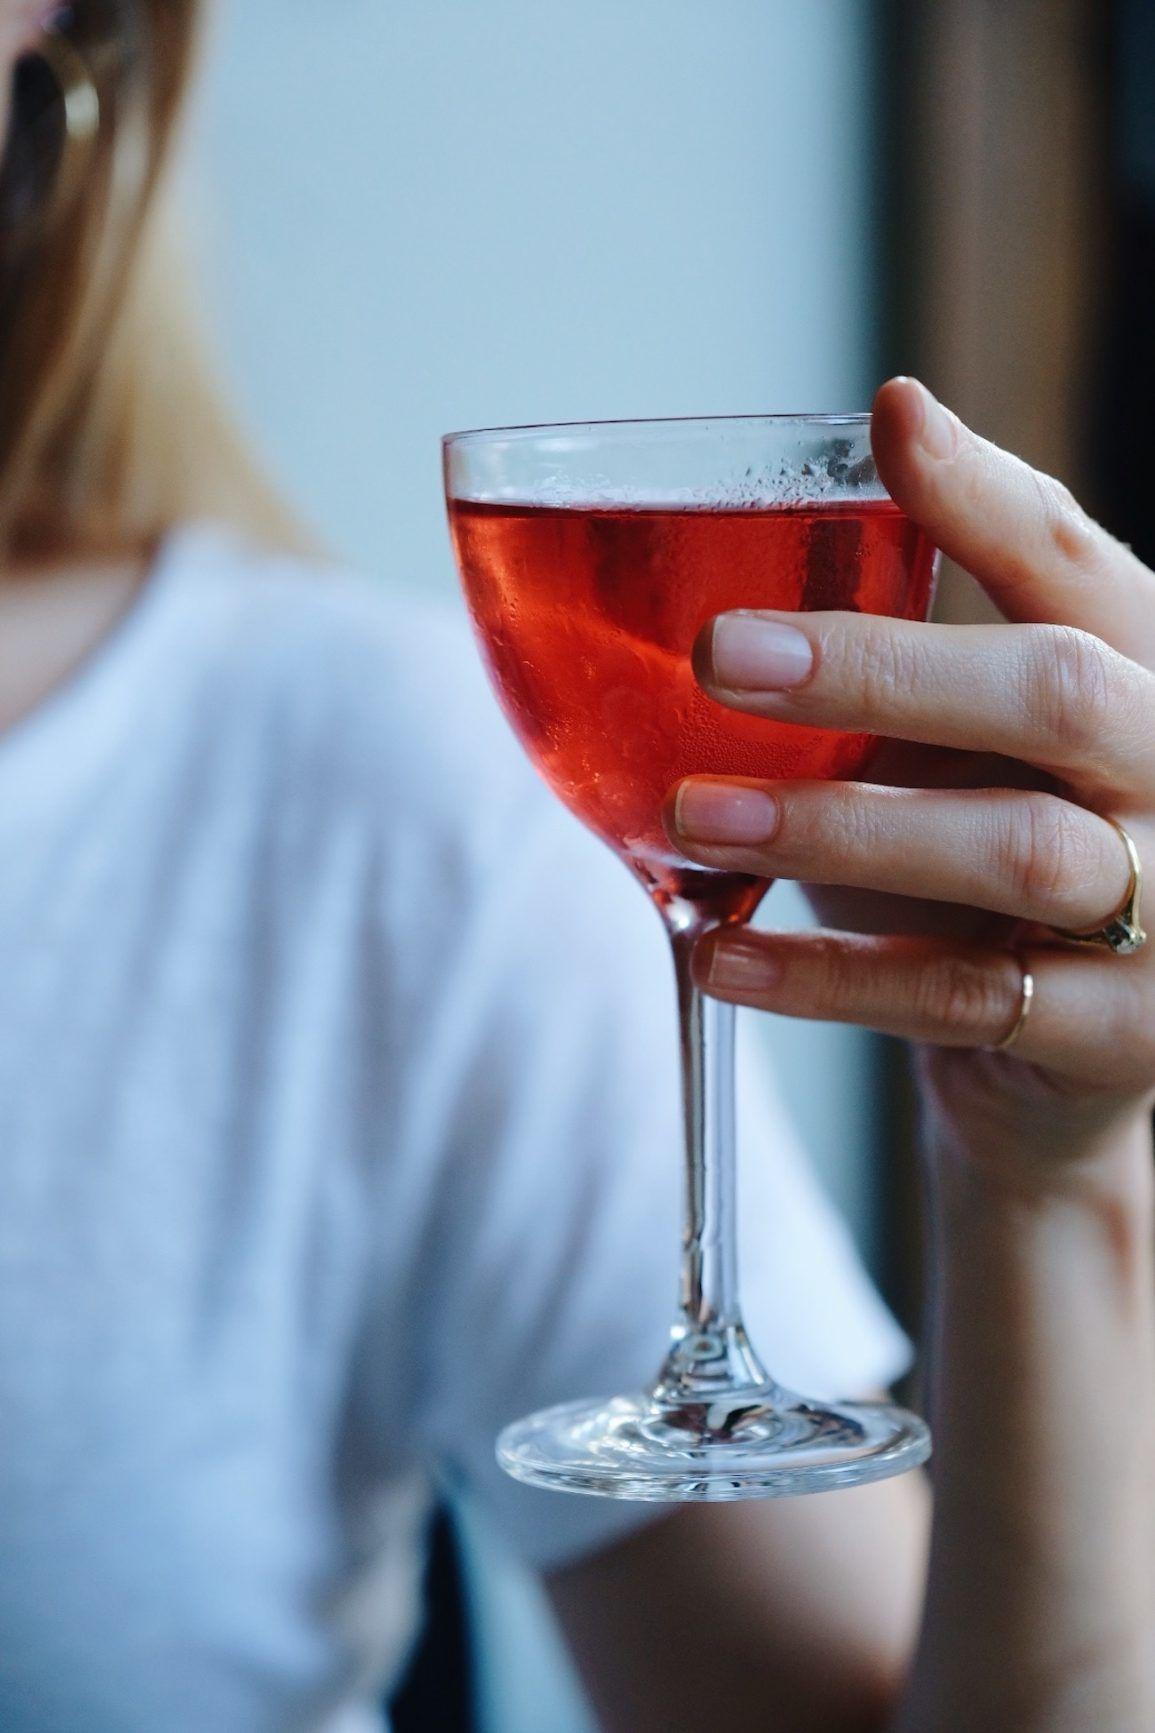 About Fuel, Foodblog, Leckerbissen, Bonvivant, Cocktail-Bistro, Drink, Bar